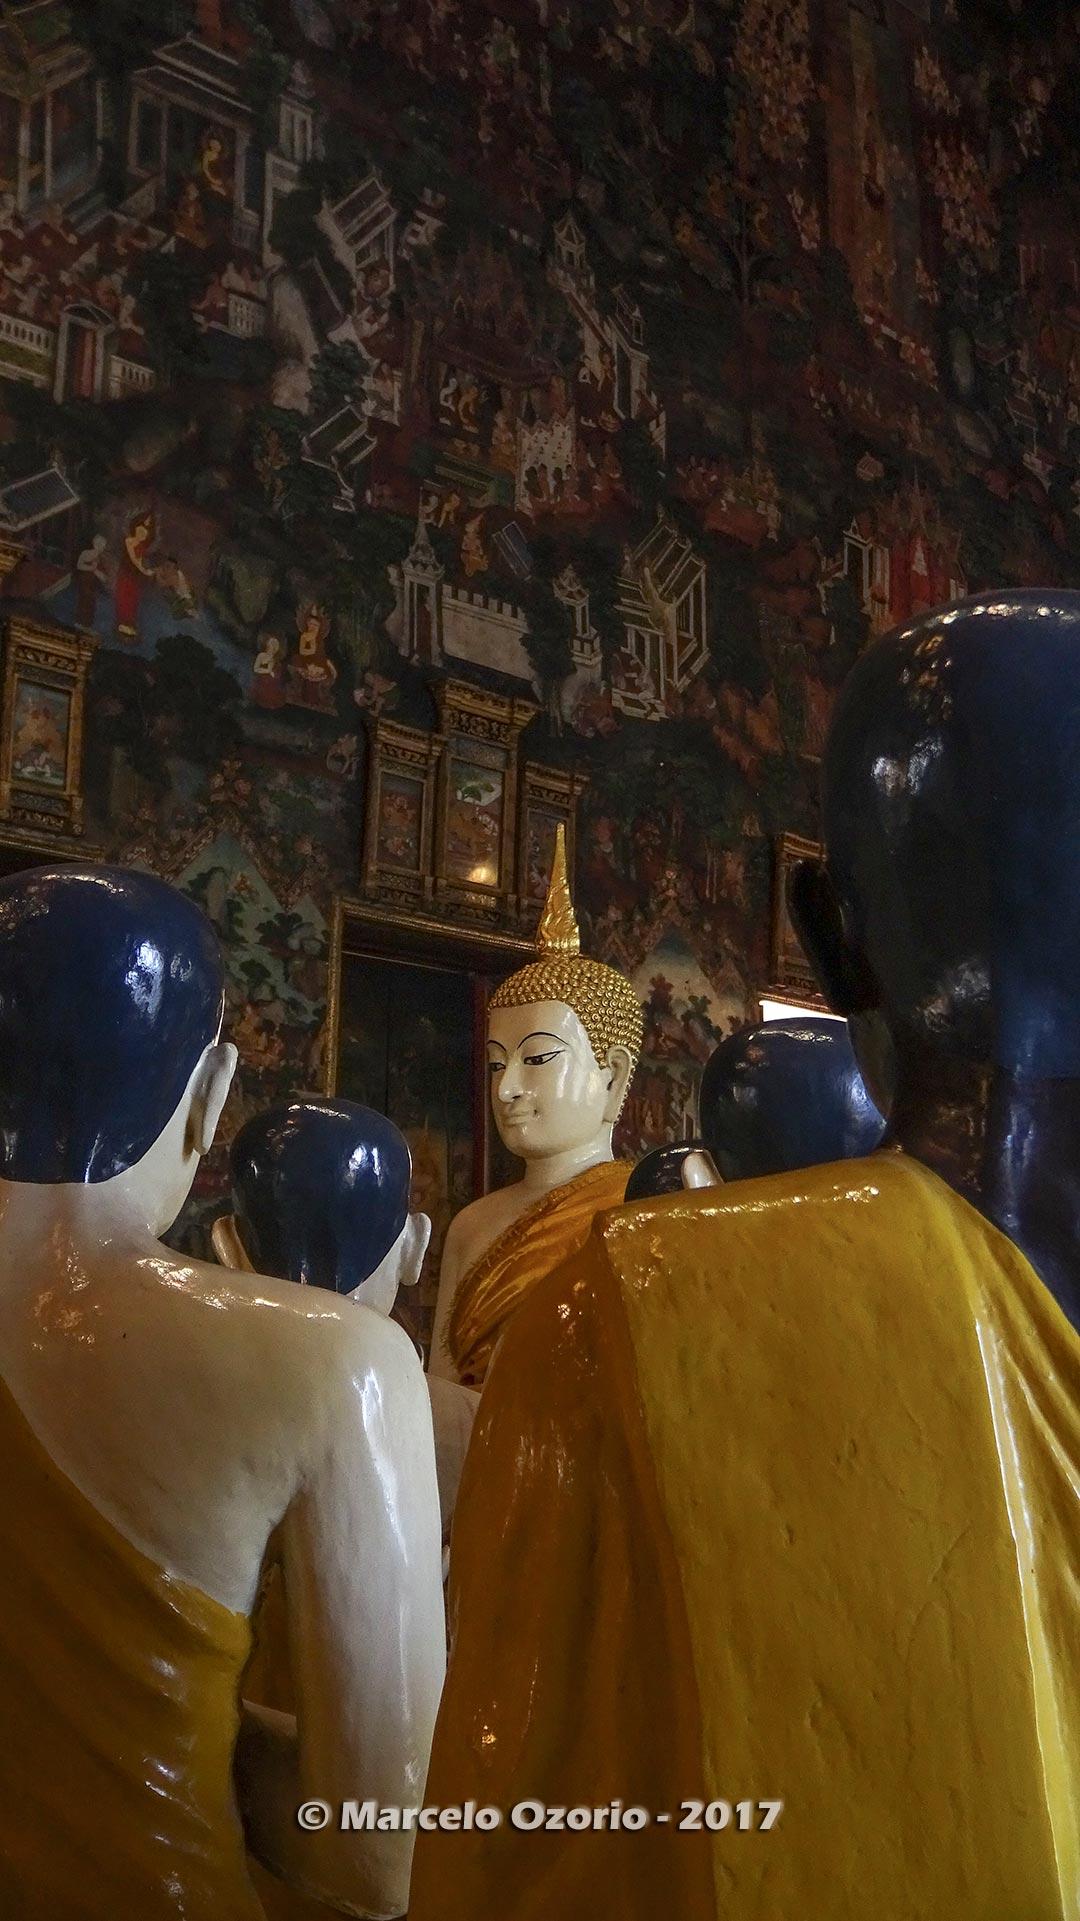 budhas bangkok thailand serie 20 - Buddhas of Bangkok - Thailand